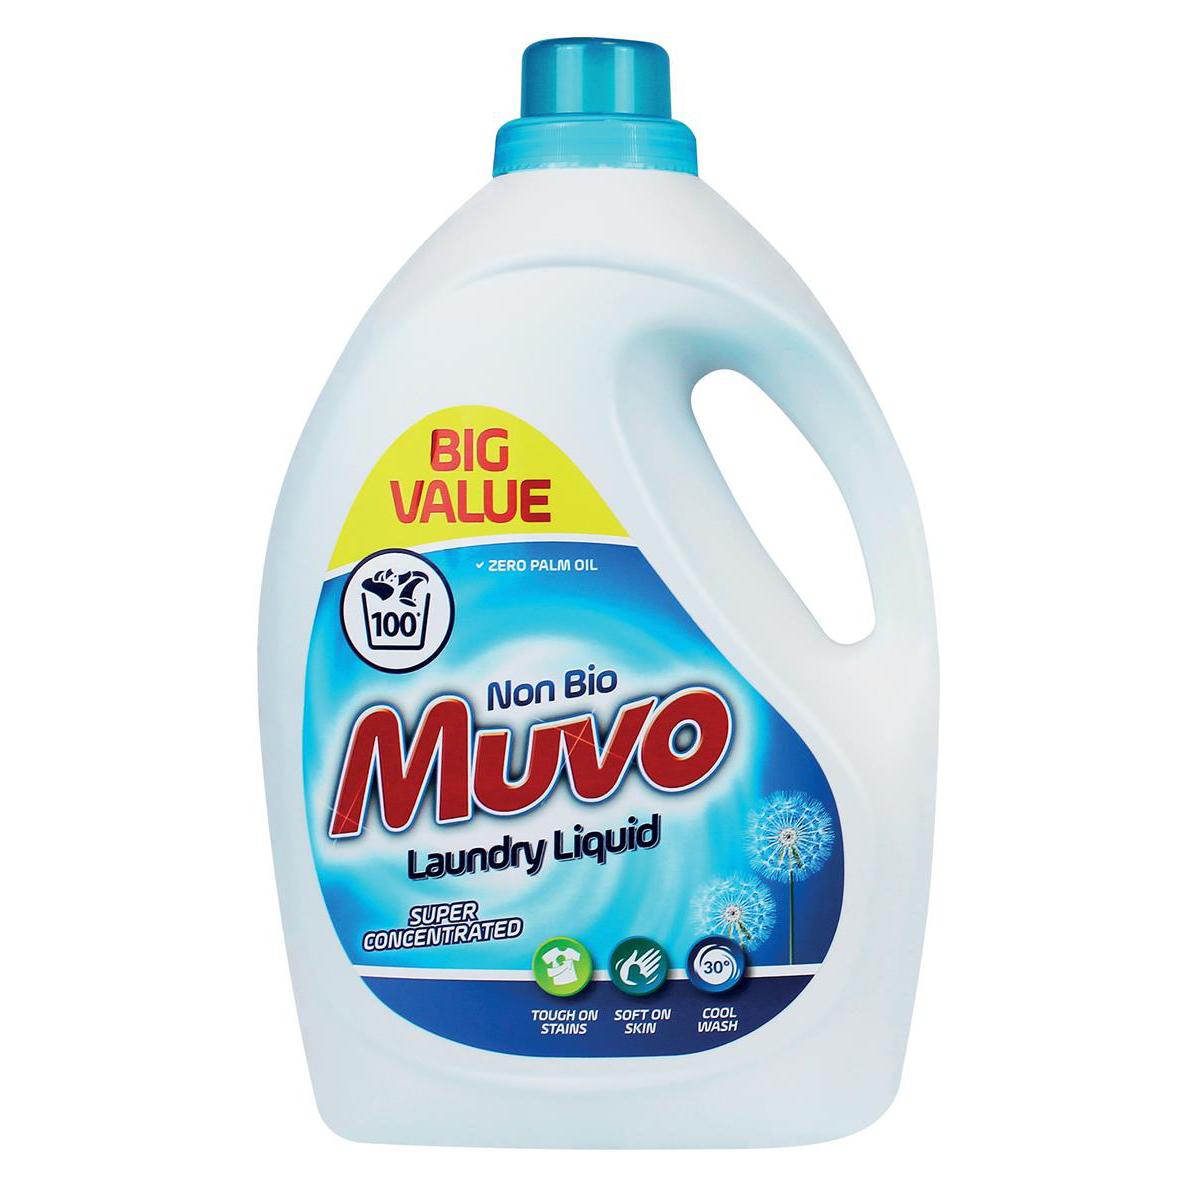 Image for Muvo Professional Liquid Laundry Detergent Non Bio 100 Washes 3 Litres Ref M3000MLNB100